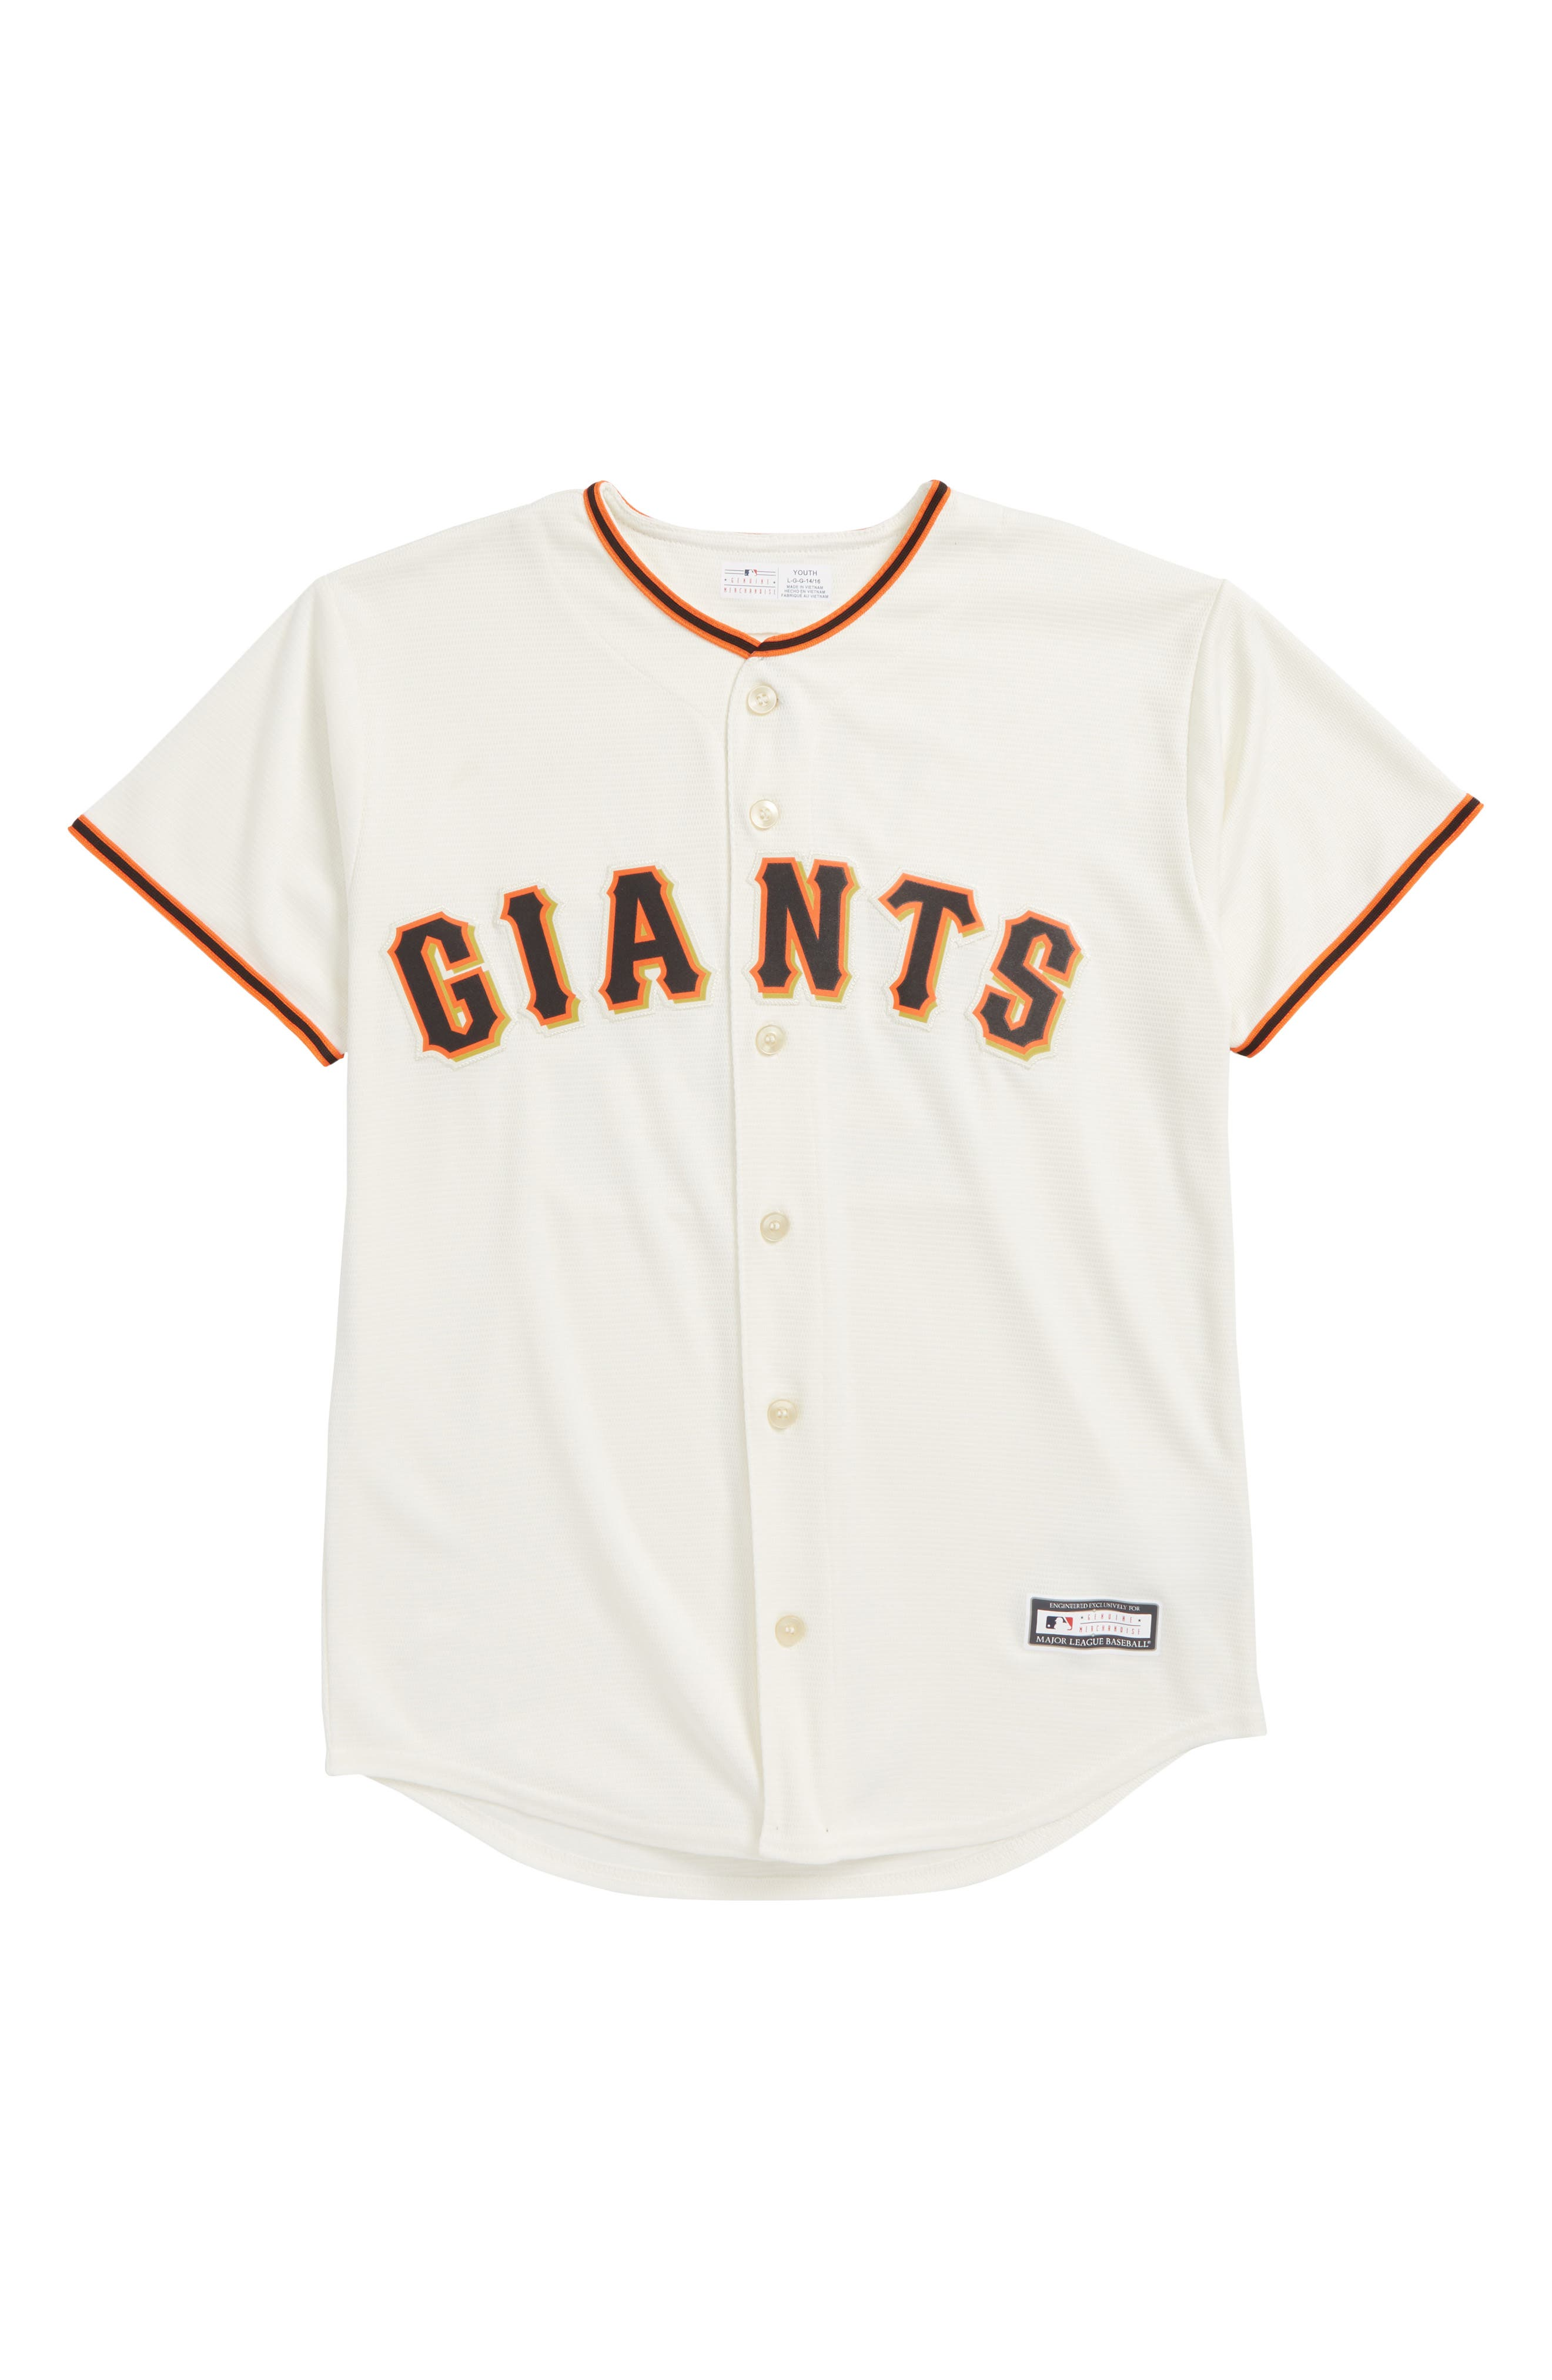 San Francisco Giants - Buster Posey Baseball Jersey,                         Main,                         color, White